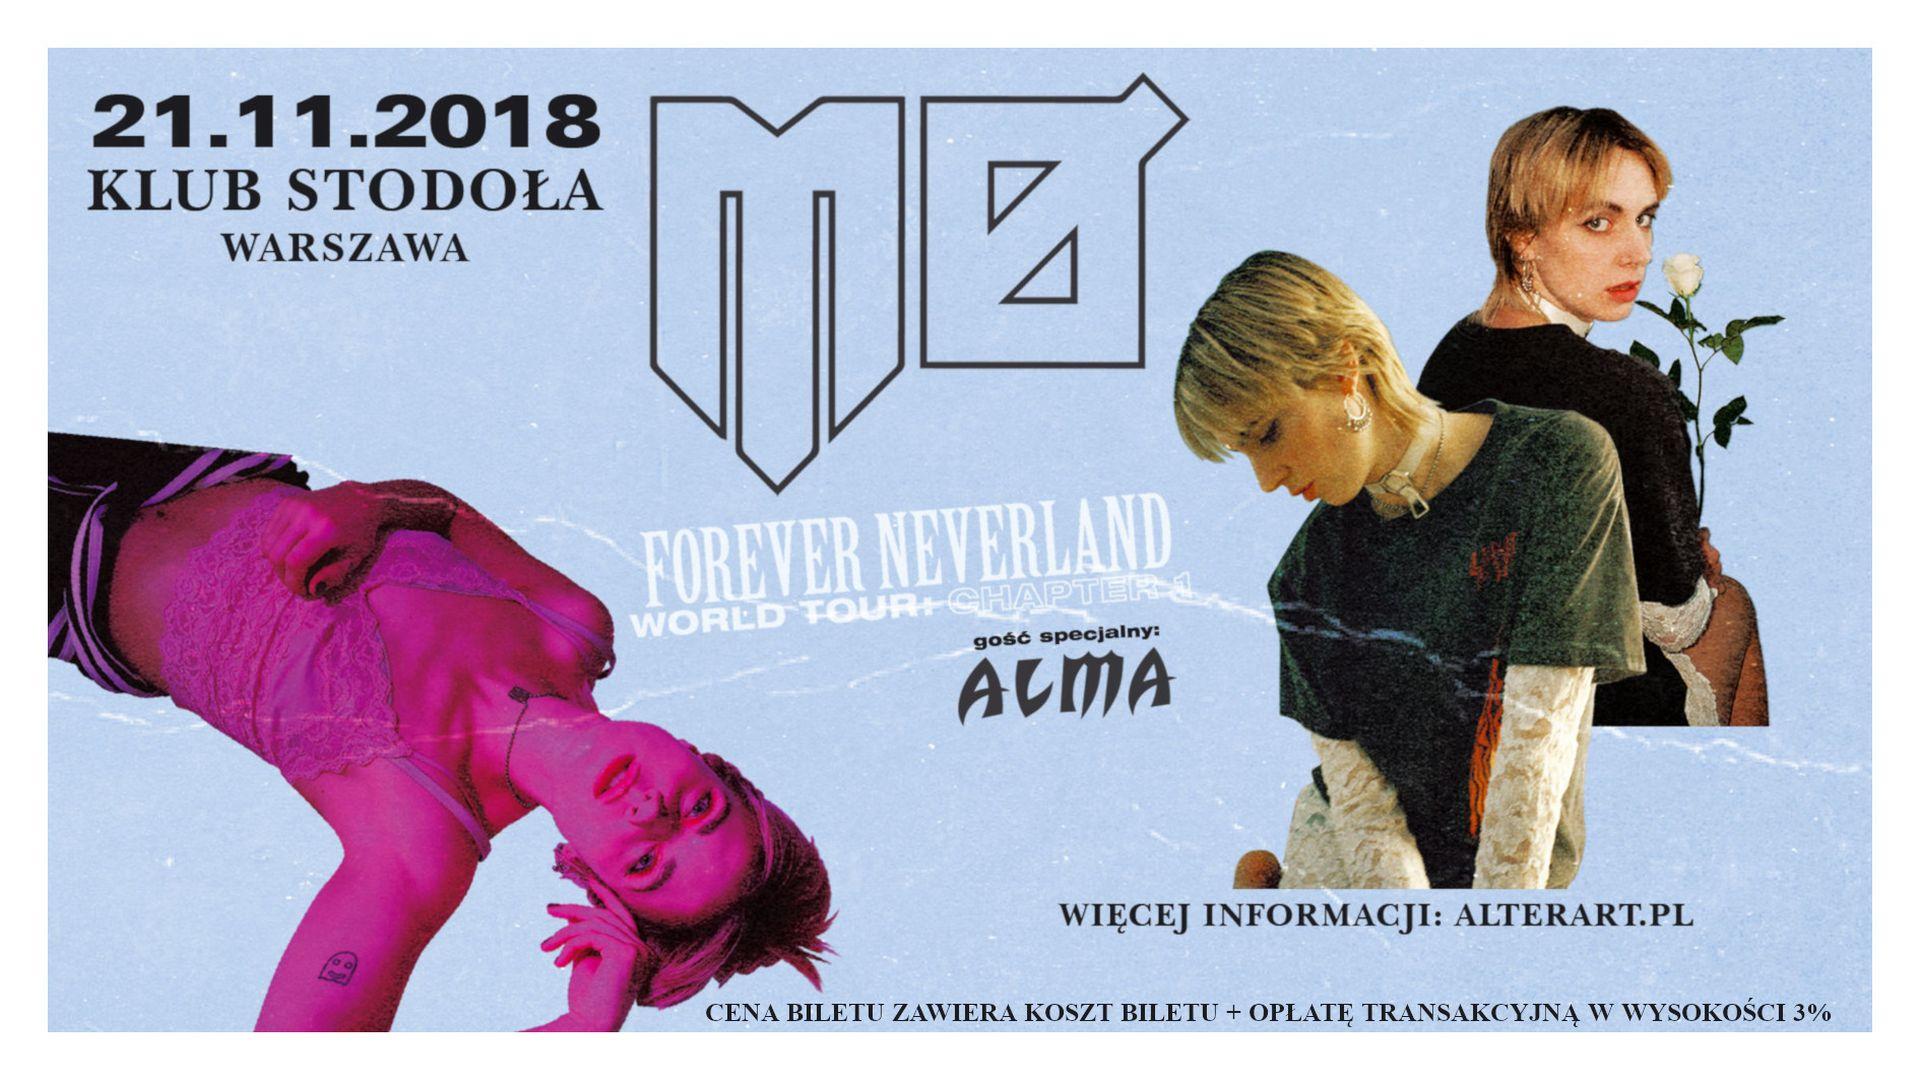 Bilety kolekcjonerskie - MO